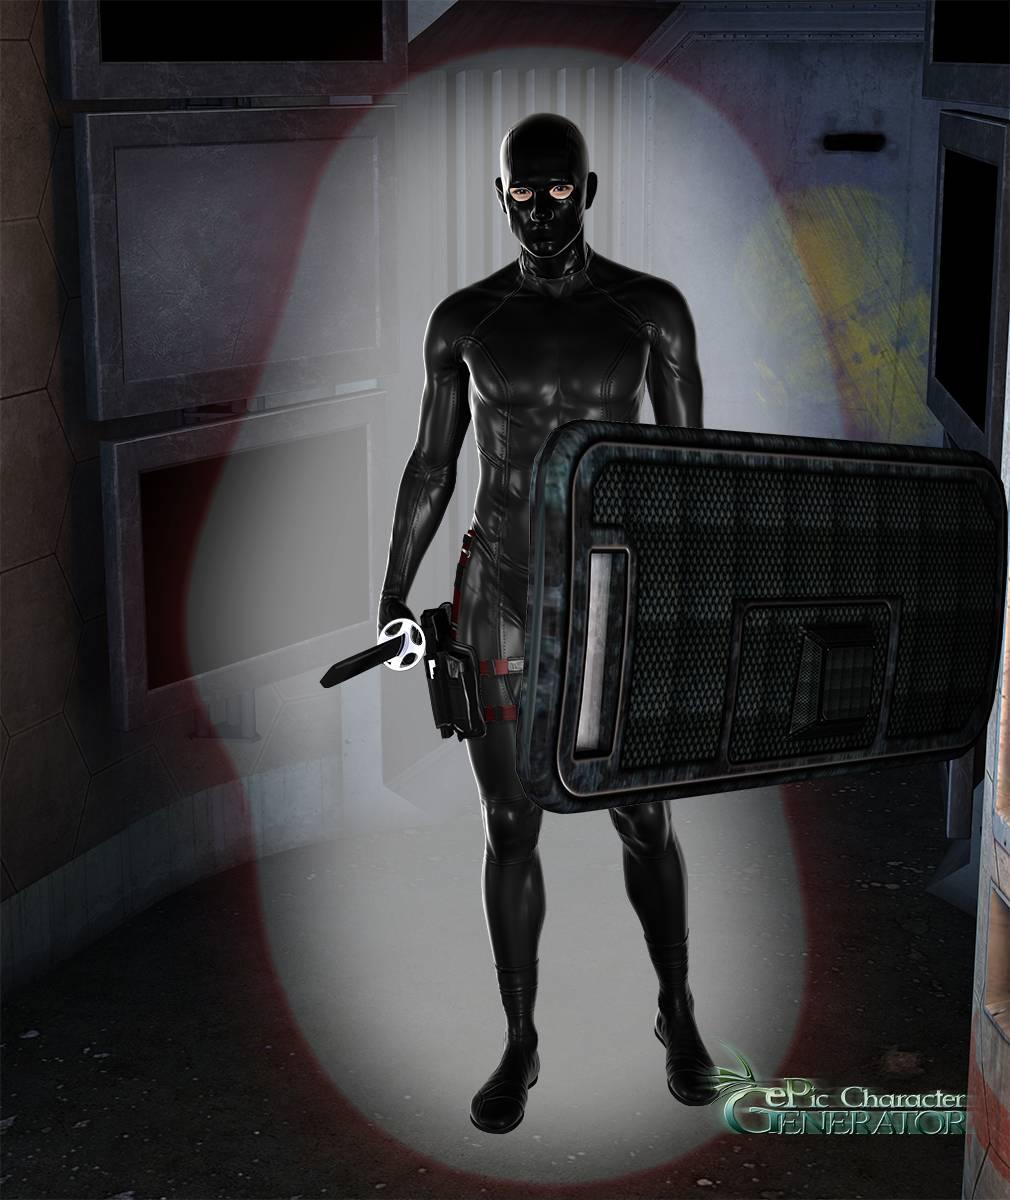 ePic Character Generator Season 2 Male Superhero Screenshot 12